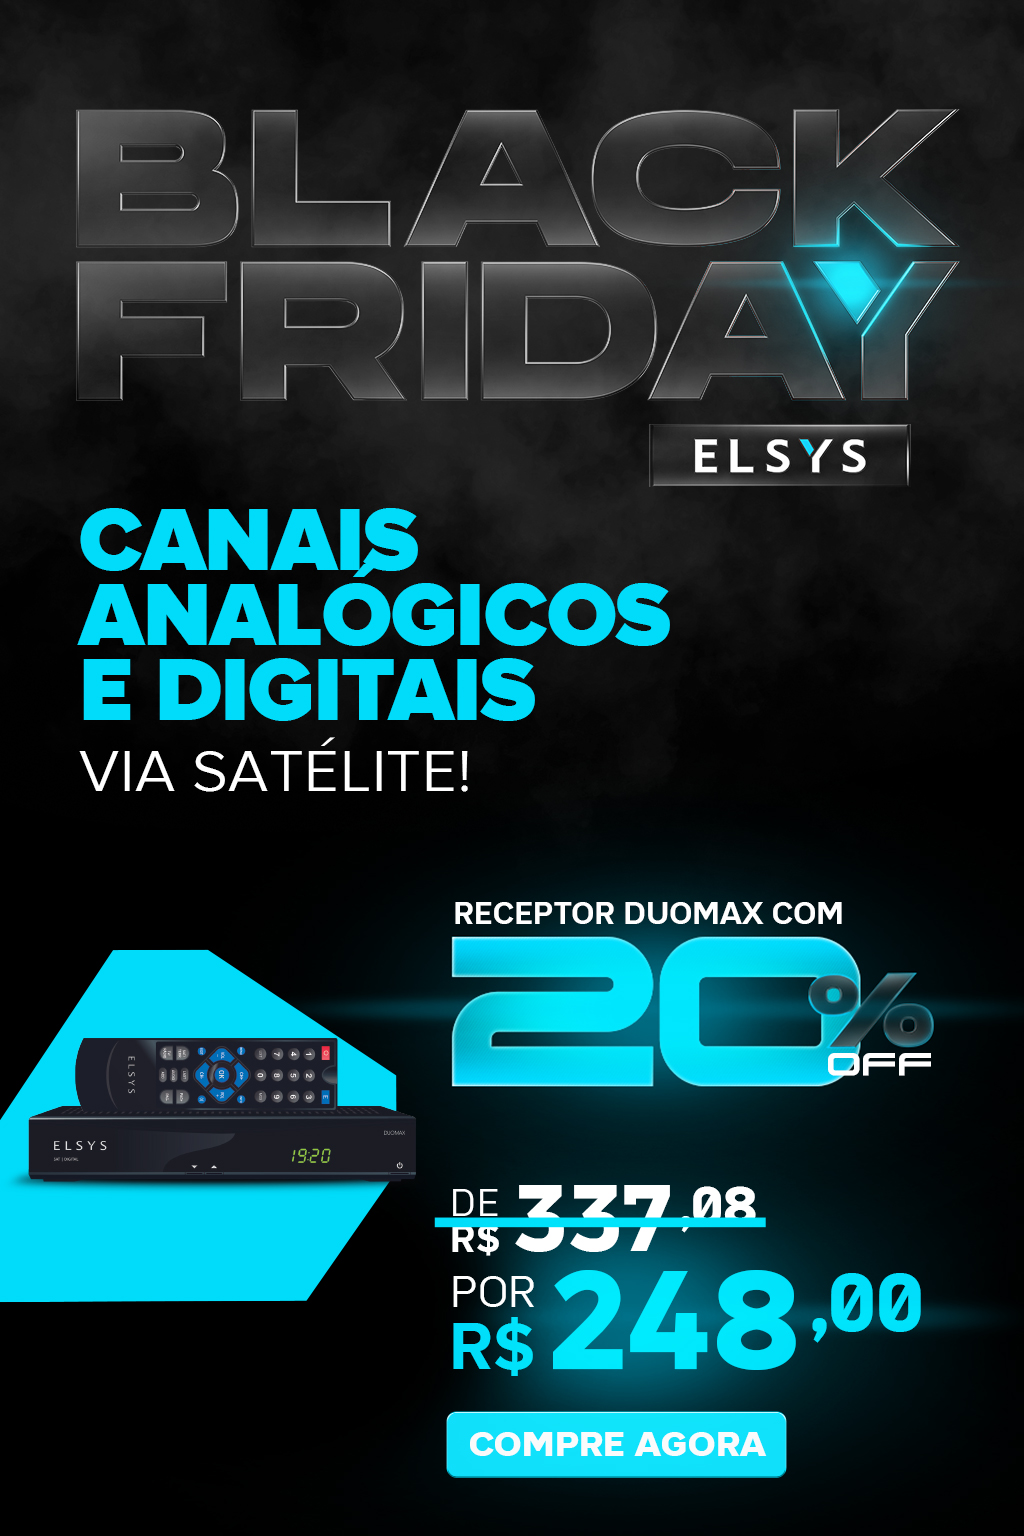 BLACK FRIDAY ELSYS - DUOMAX